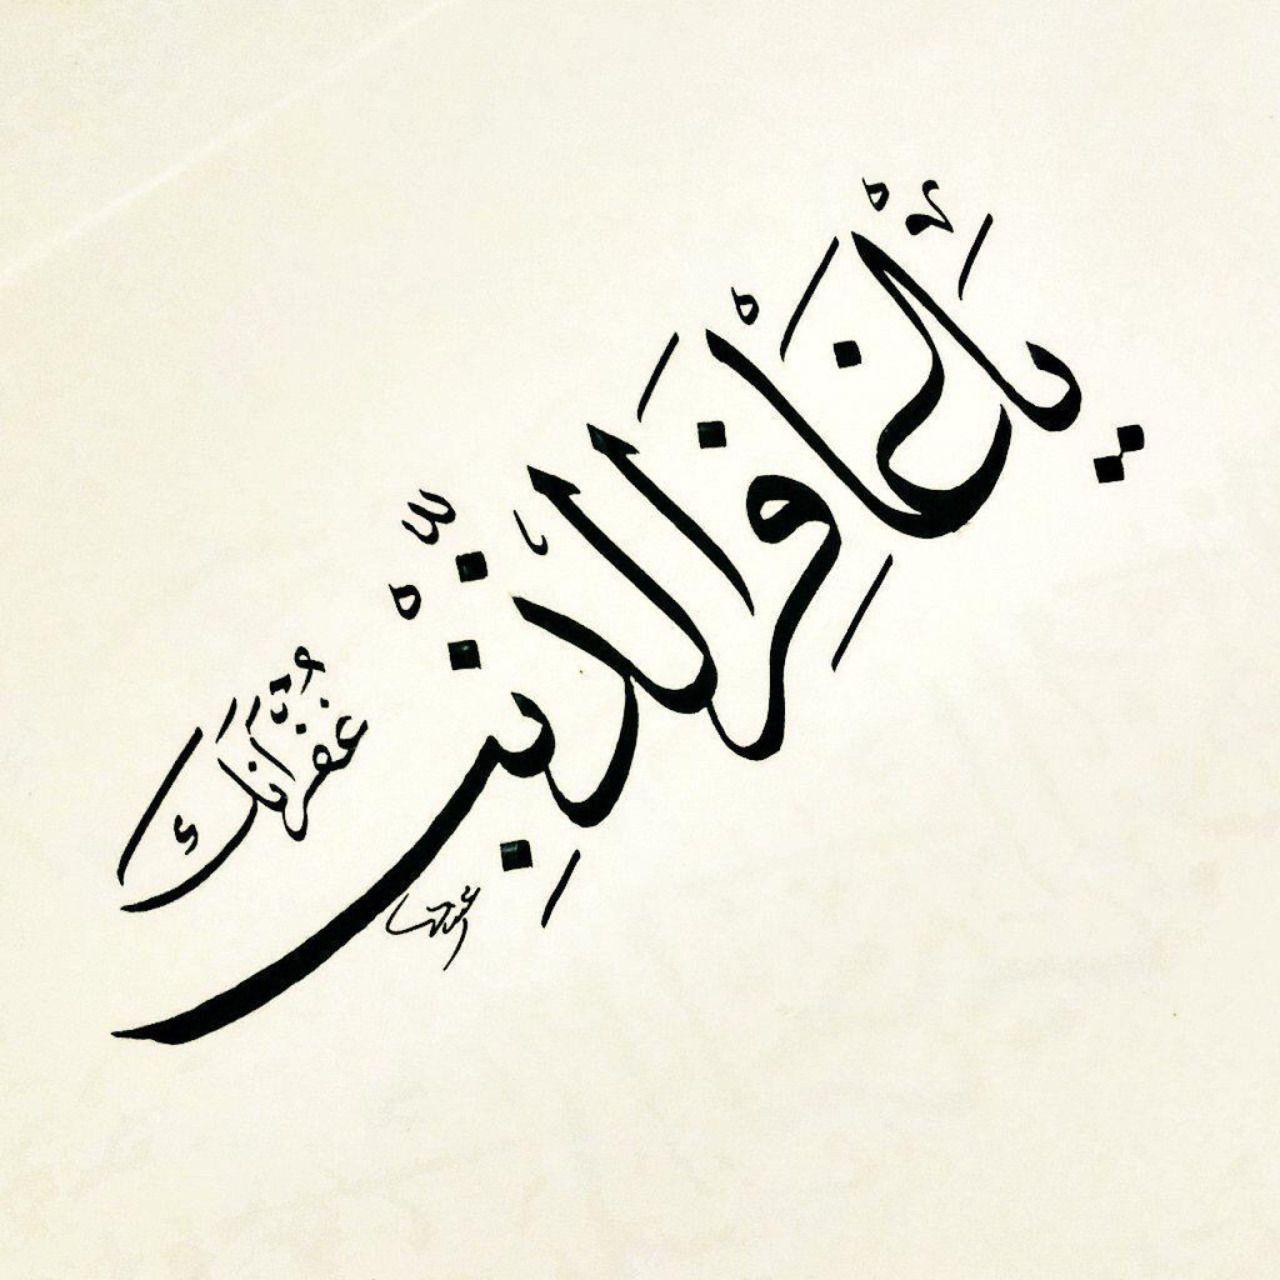 Arabiccalligraphy Islamic Art Calligraphy Islamic Calligraphy Arabic Calligraphy Art